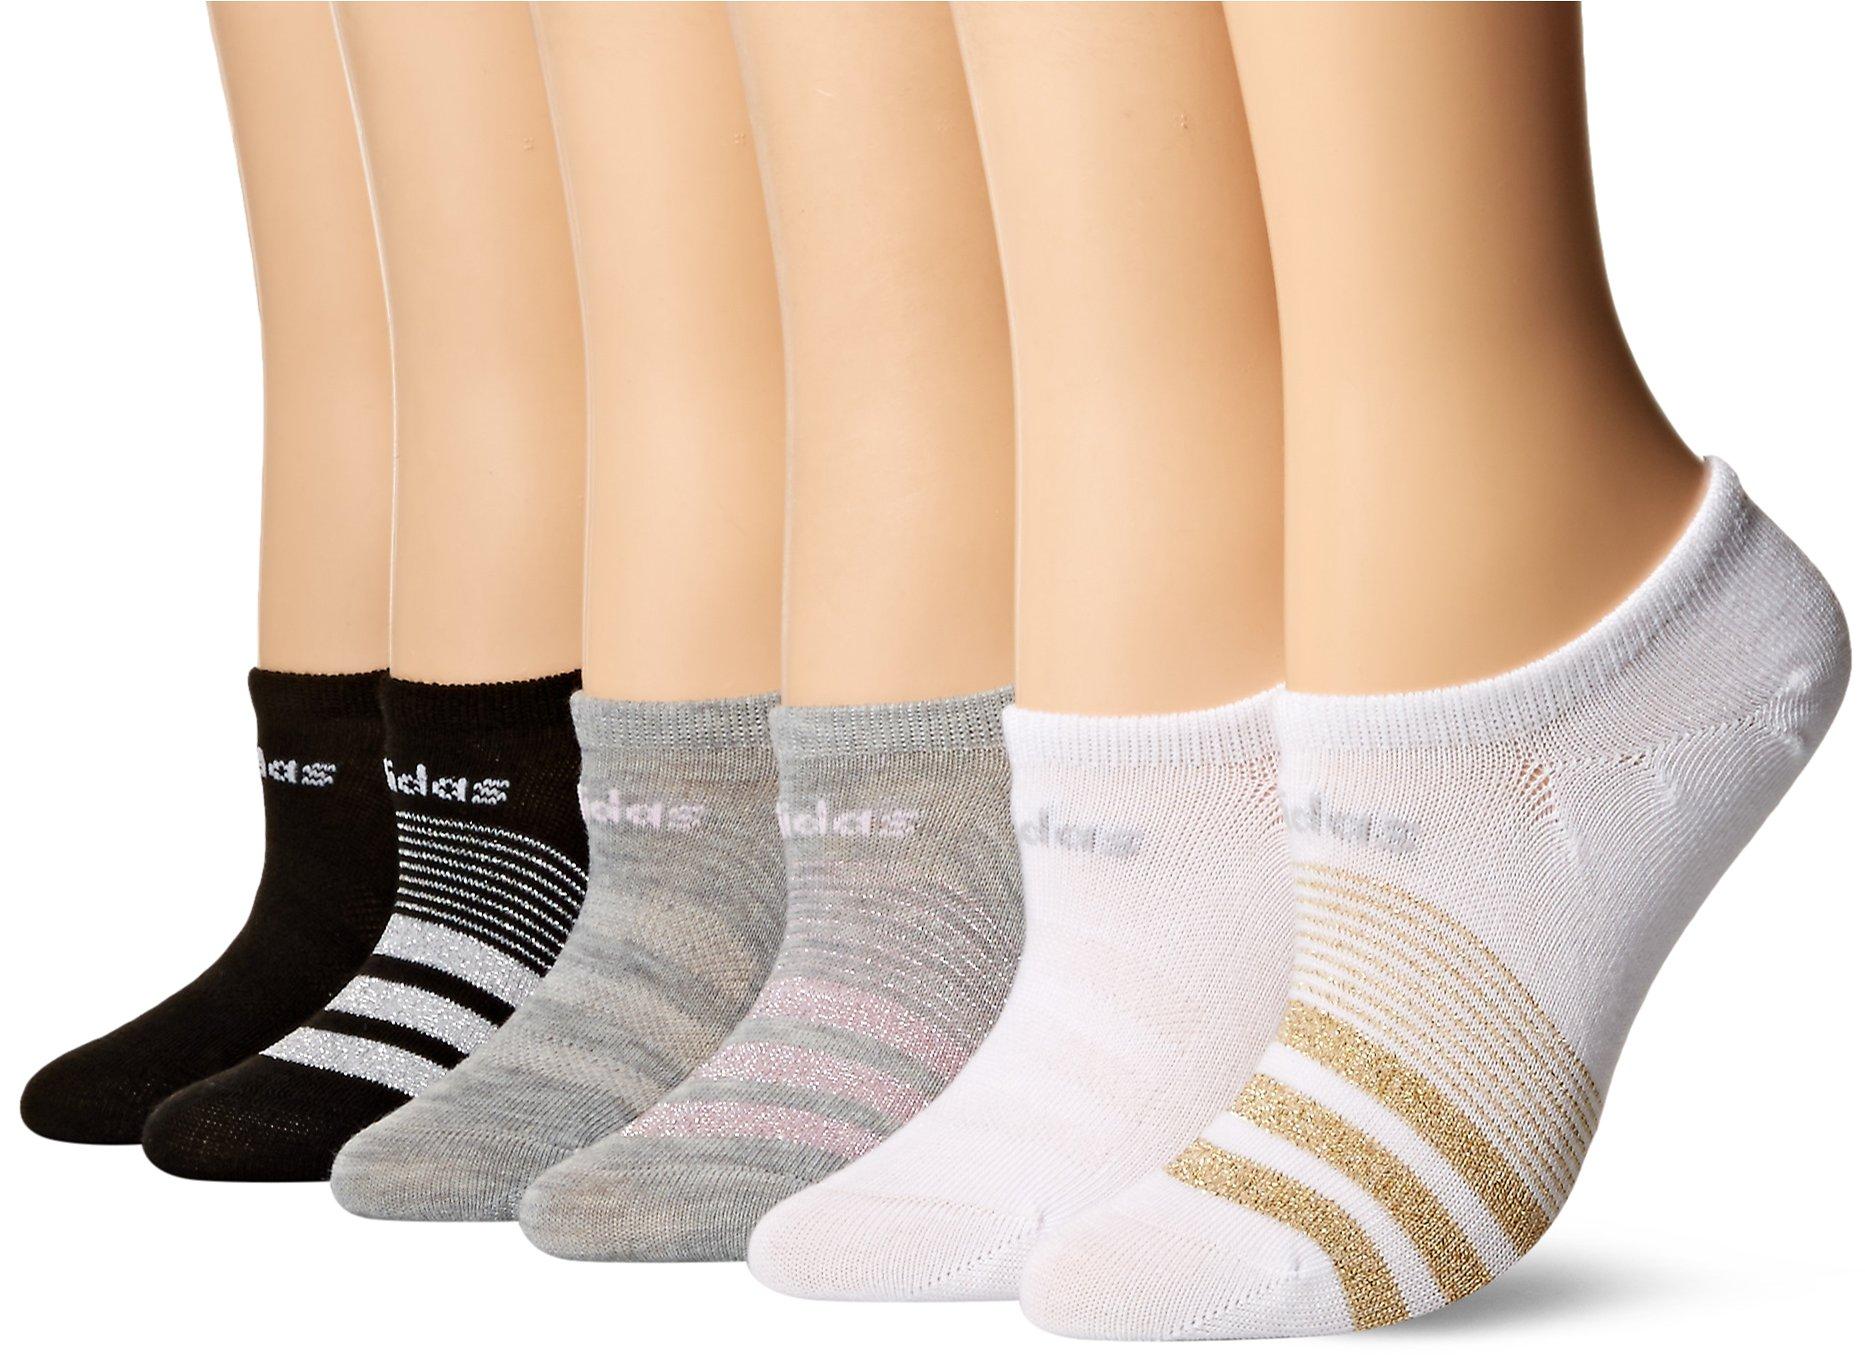 adidas Women's Superlite Super No Show Socks (6-Pack), Assorted, 5-10